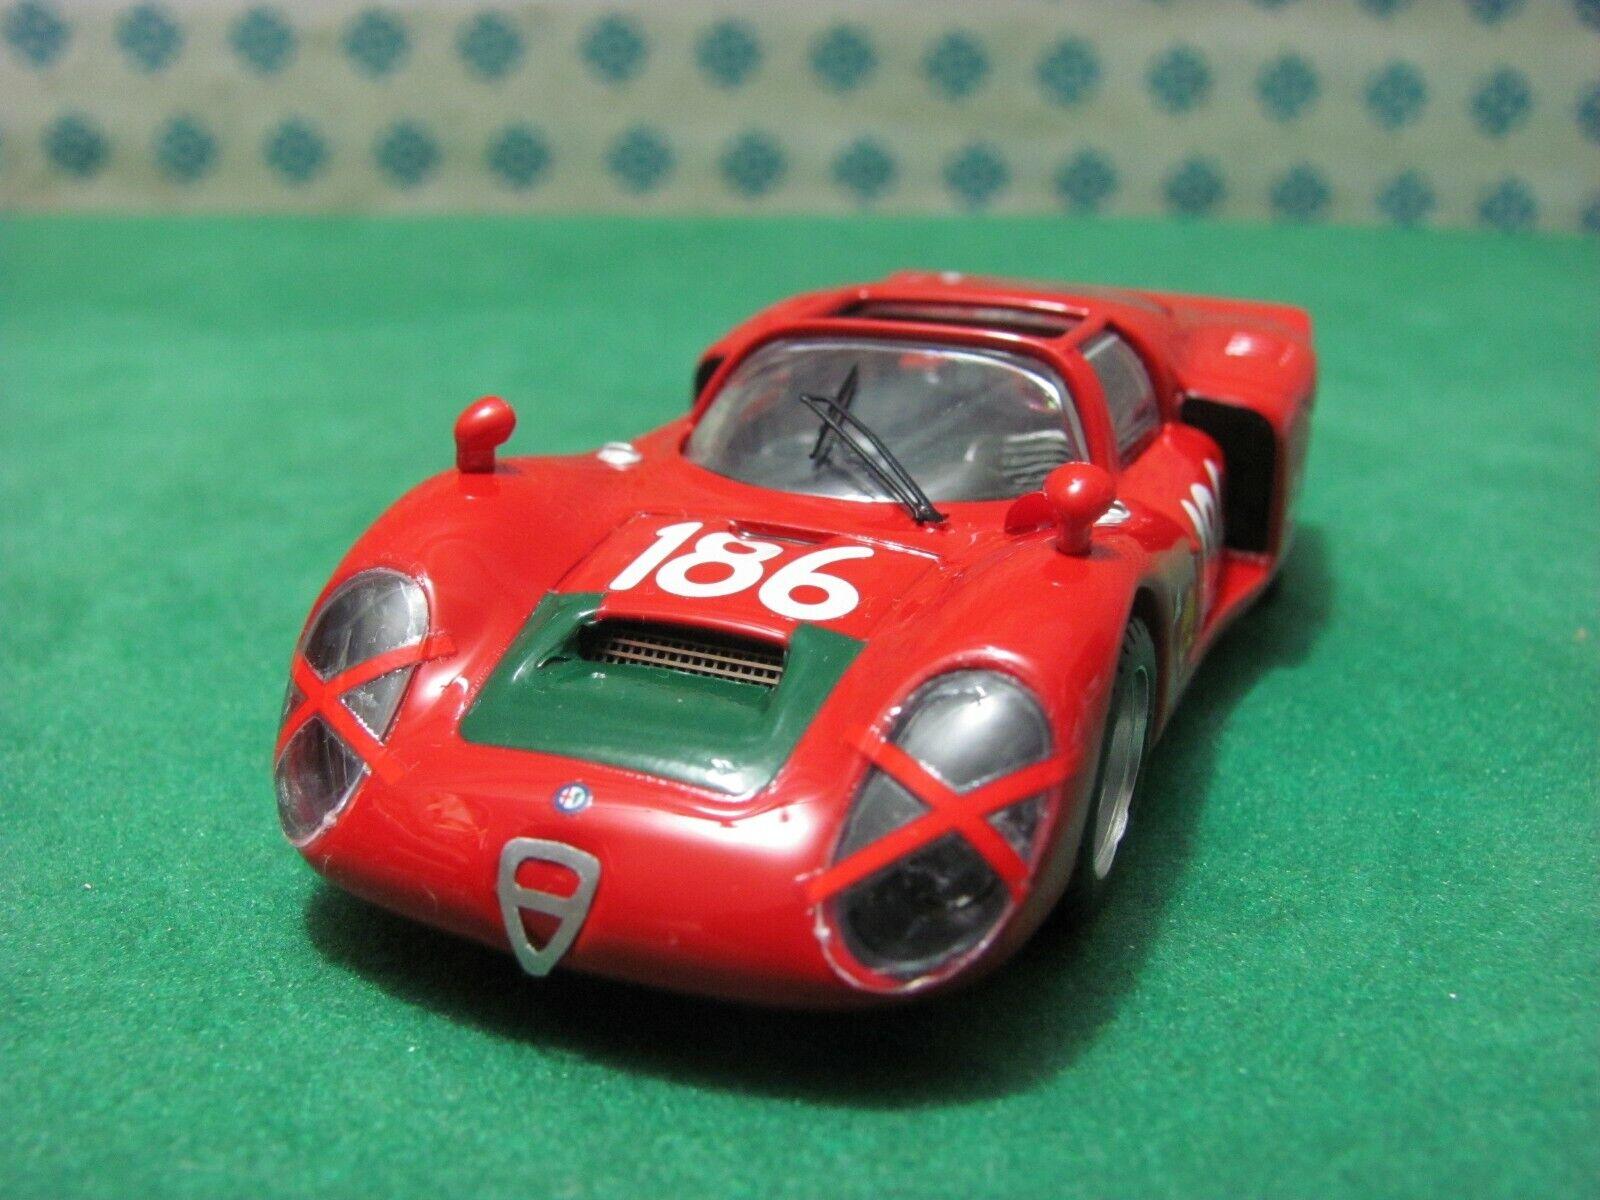 ALFA ROMEO 33 2 Spyder 2000. Autodelta  Targa Florio 1968  - 1 43 Best 9422 LE